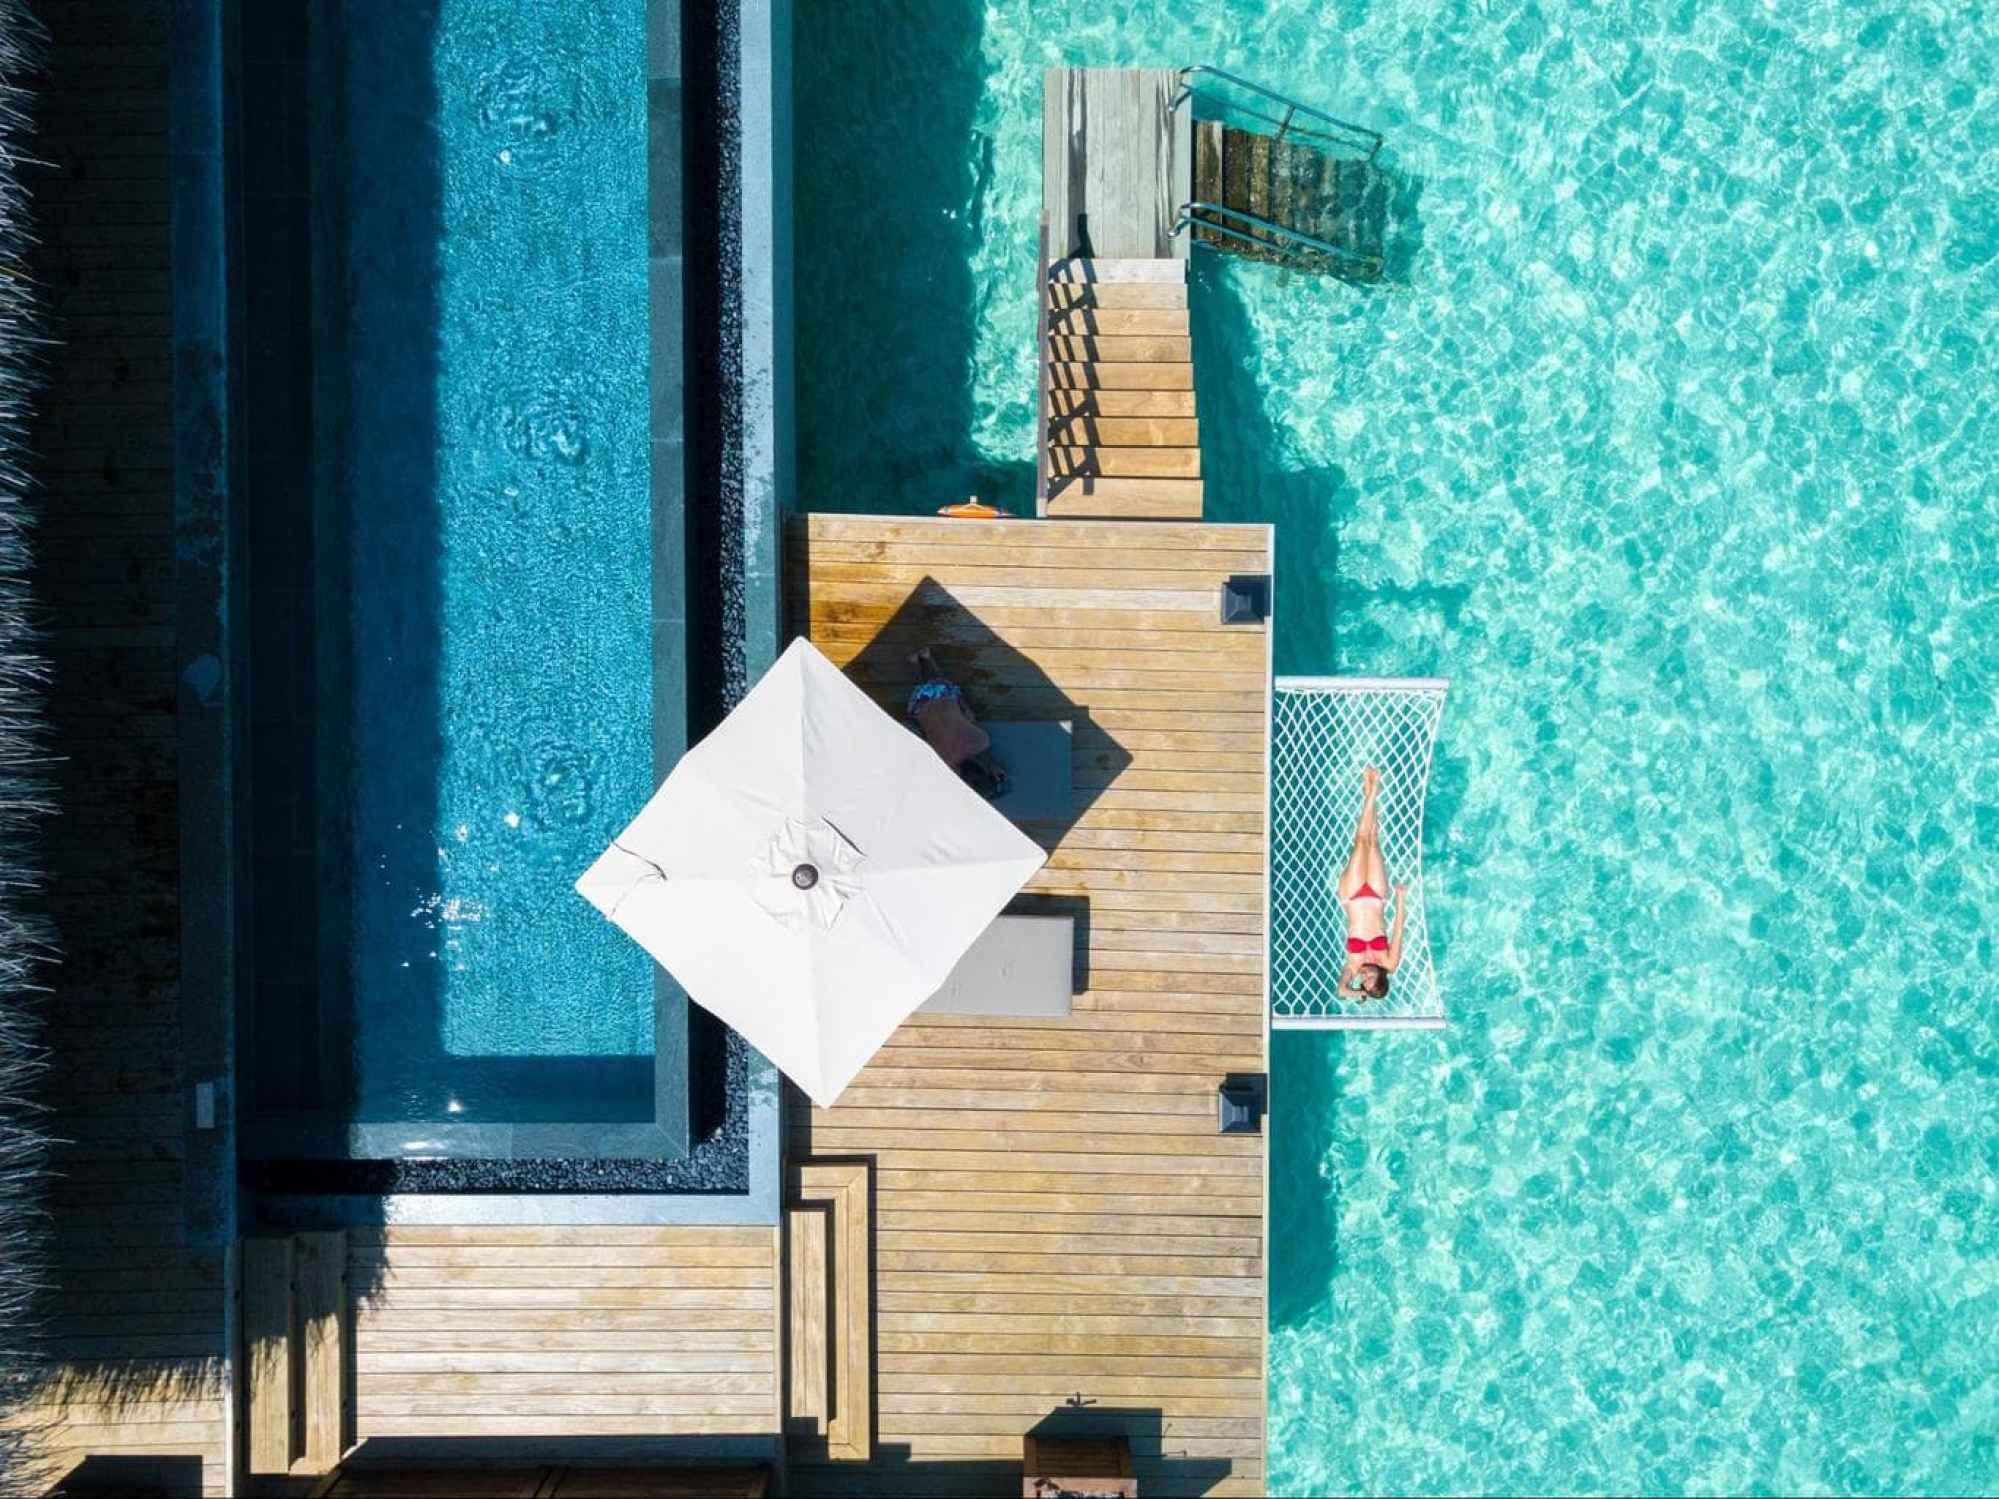 Outdoor decks at Joali's Luxury Water Villas